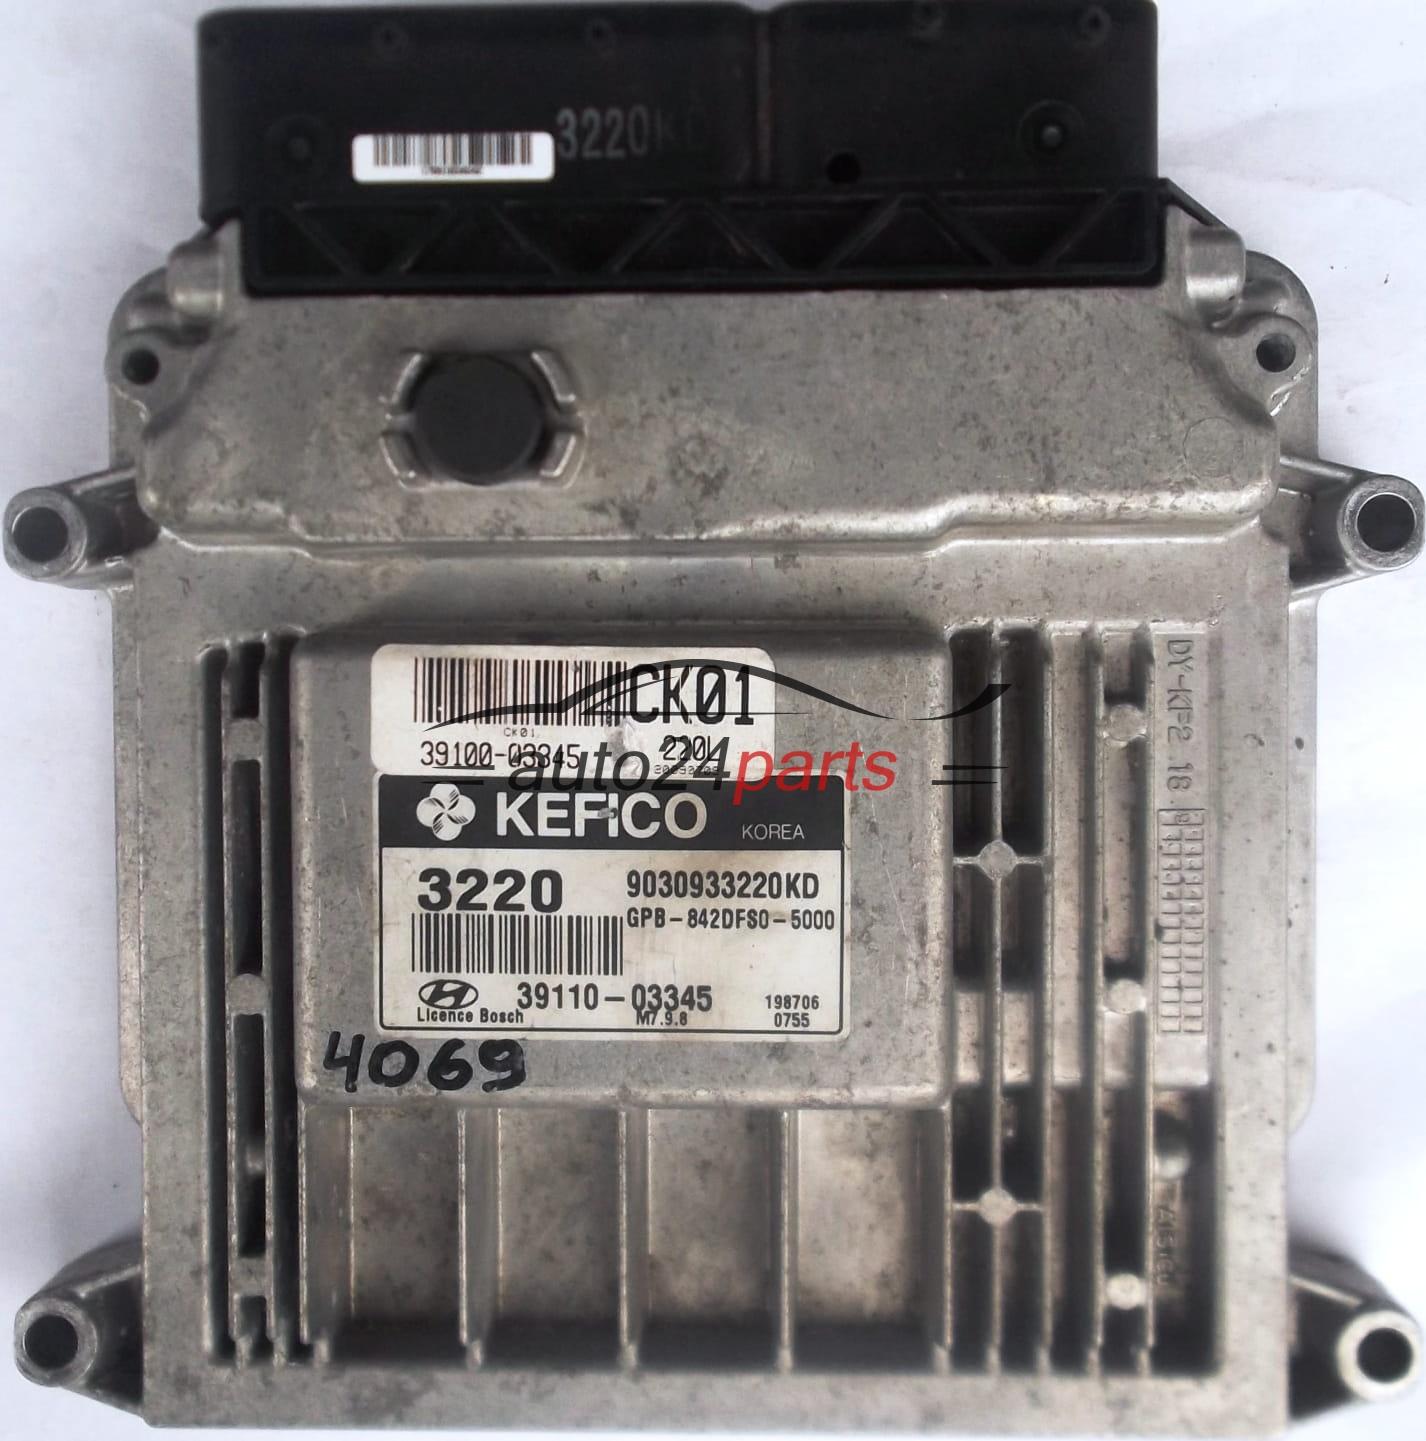 ECU ENGINE CONTROLLER HYUNDAI I20 1 2 3910003345 CK01 39100-03345  3911003345 39110-03345 3220 9030933220KD GPB842DFS05000 GPB-842DFS0-5000